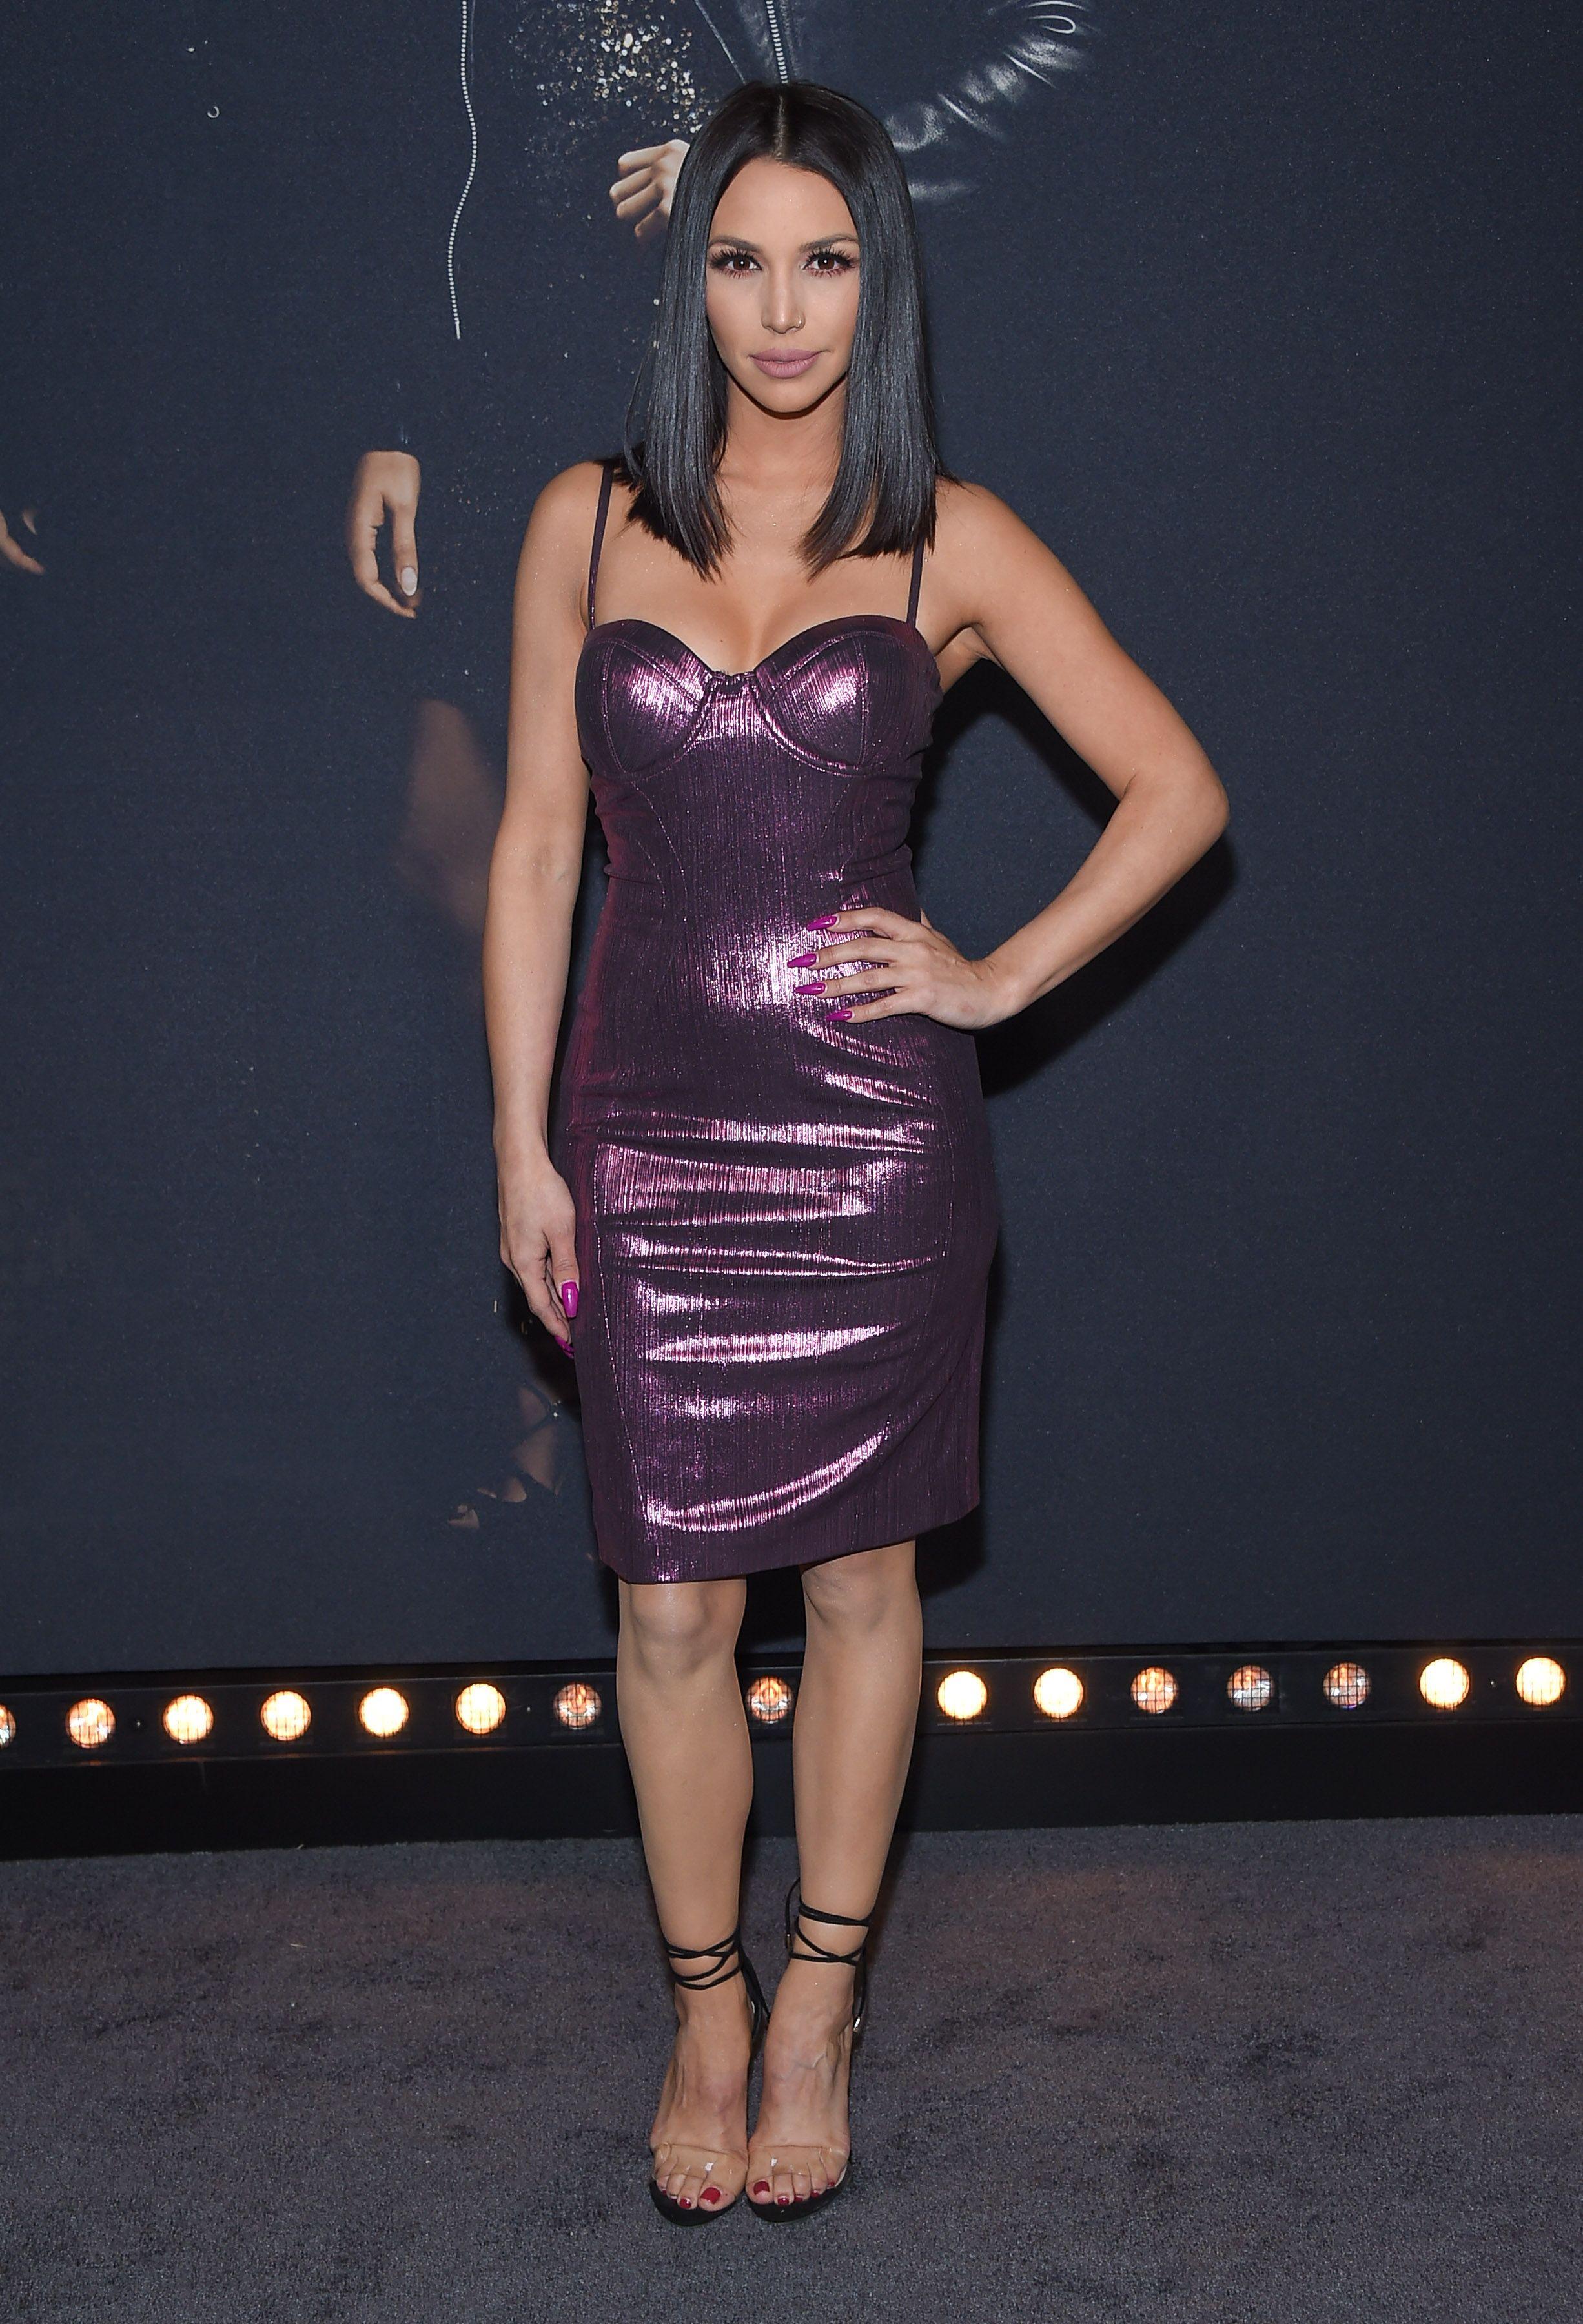 Scheana Shay wears a purple latex dress.